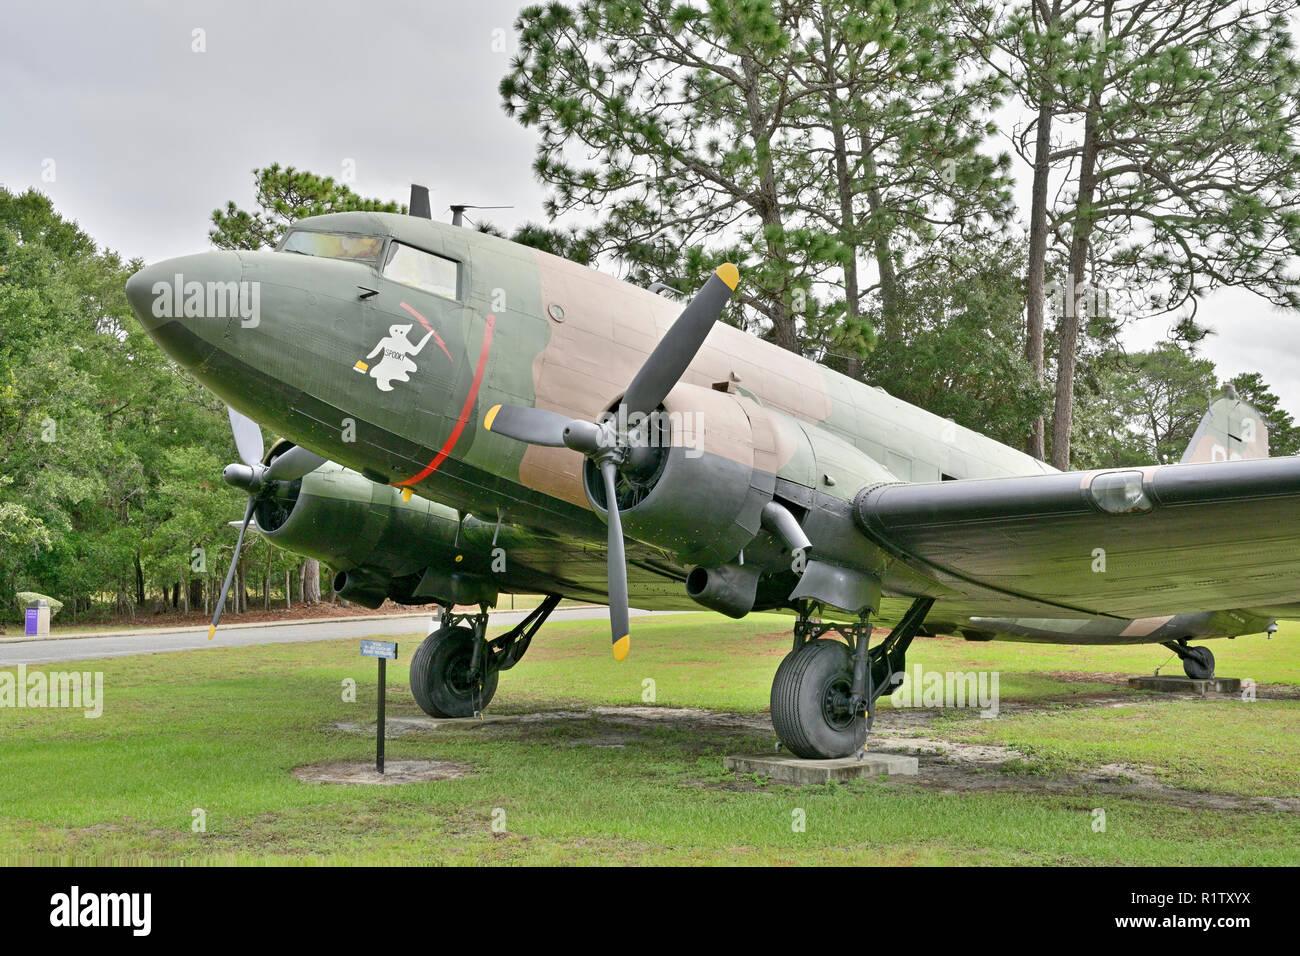 AC 47 Spooky Vietnam War era gunship on static display at the outdoor air museum at Eglin AFB, Fort Walton Beach Florida, USA. - Stock Image